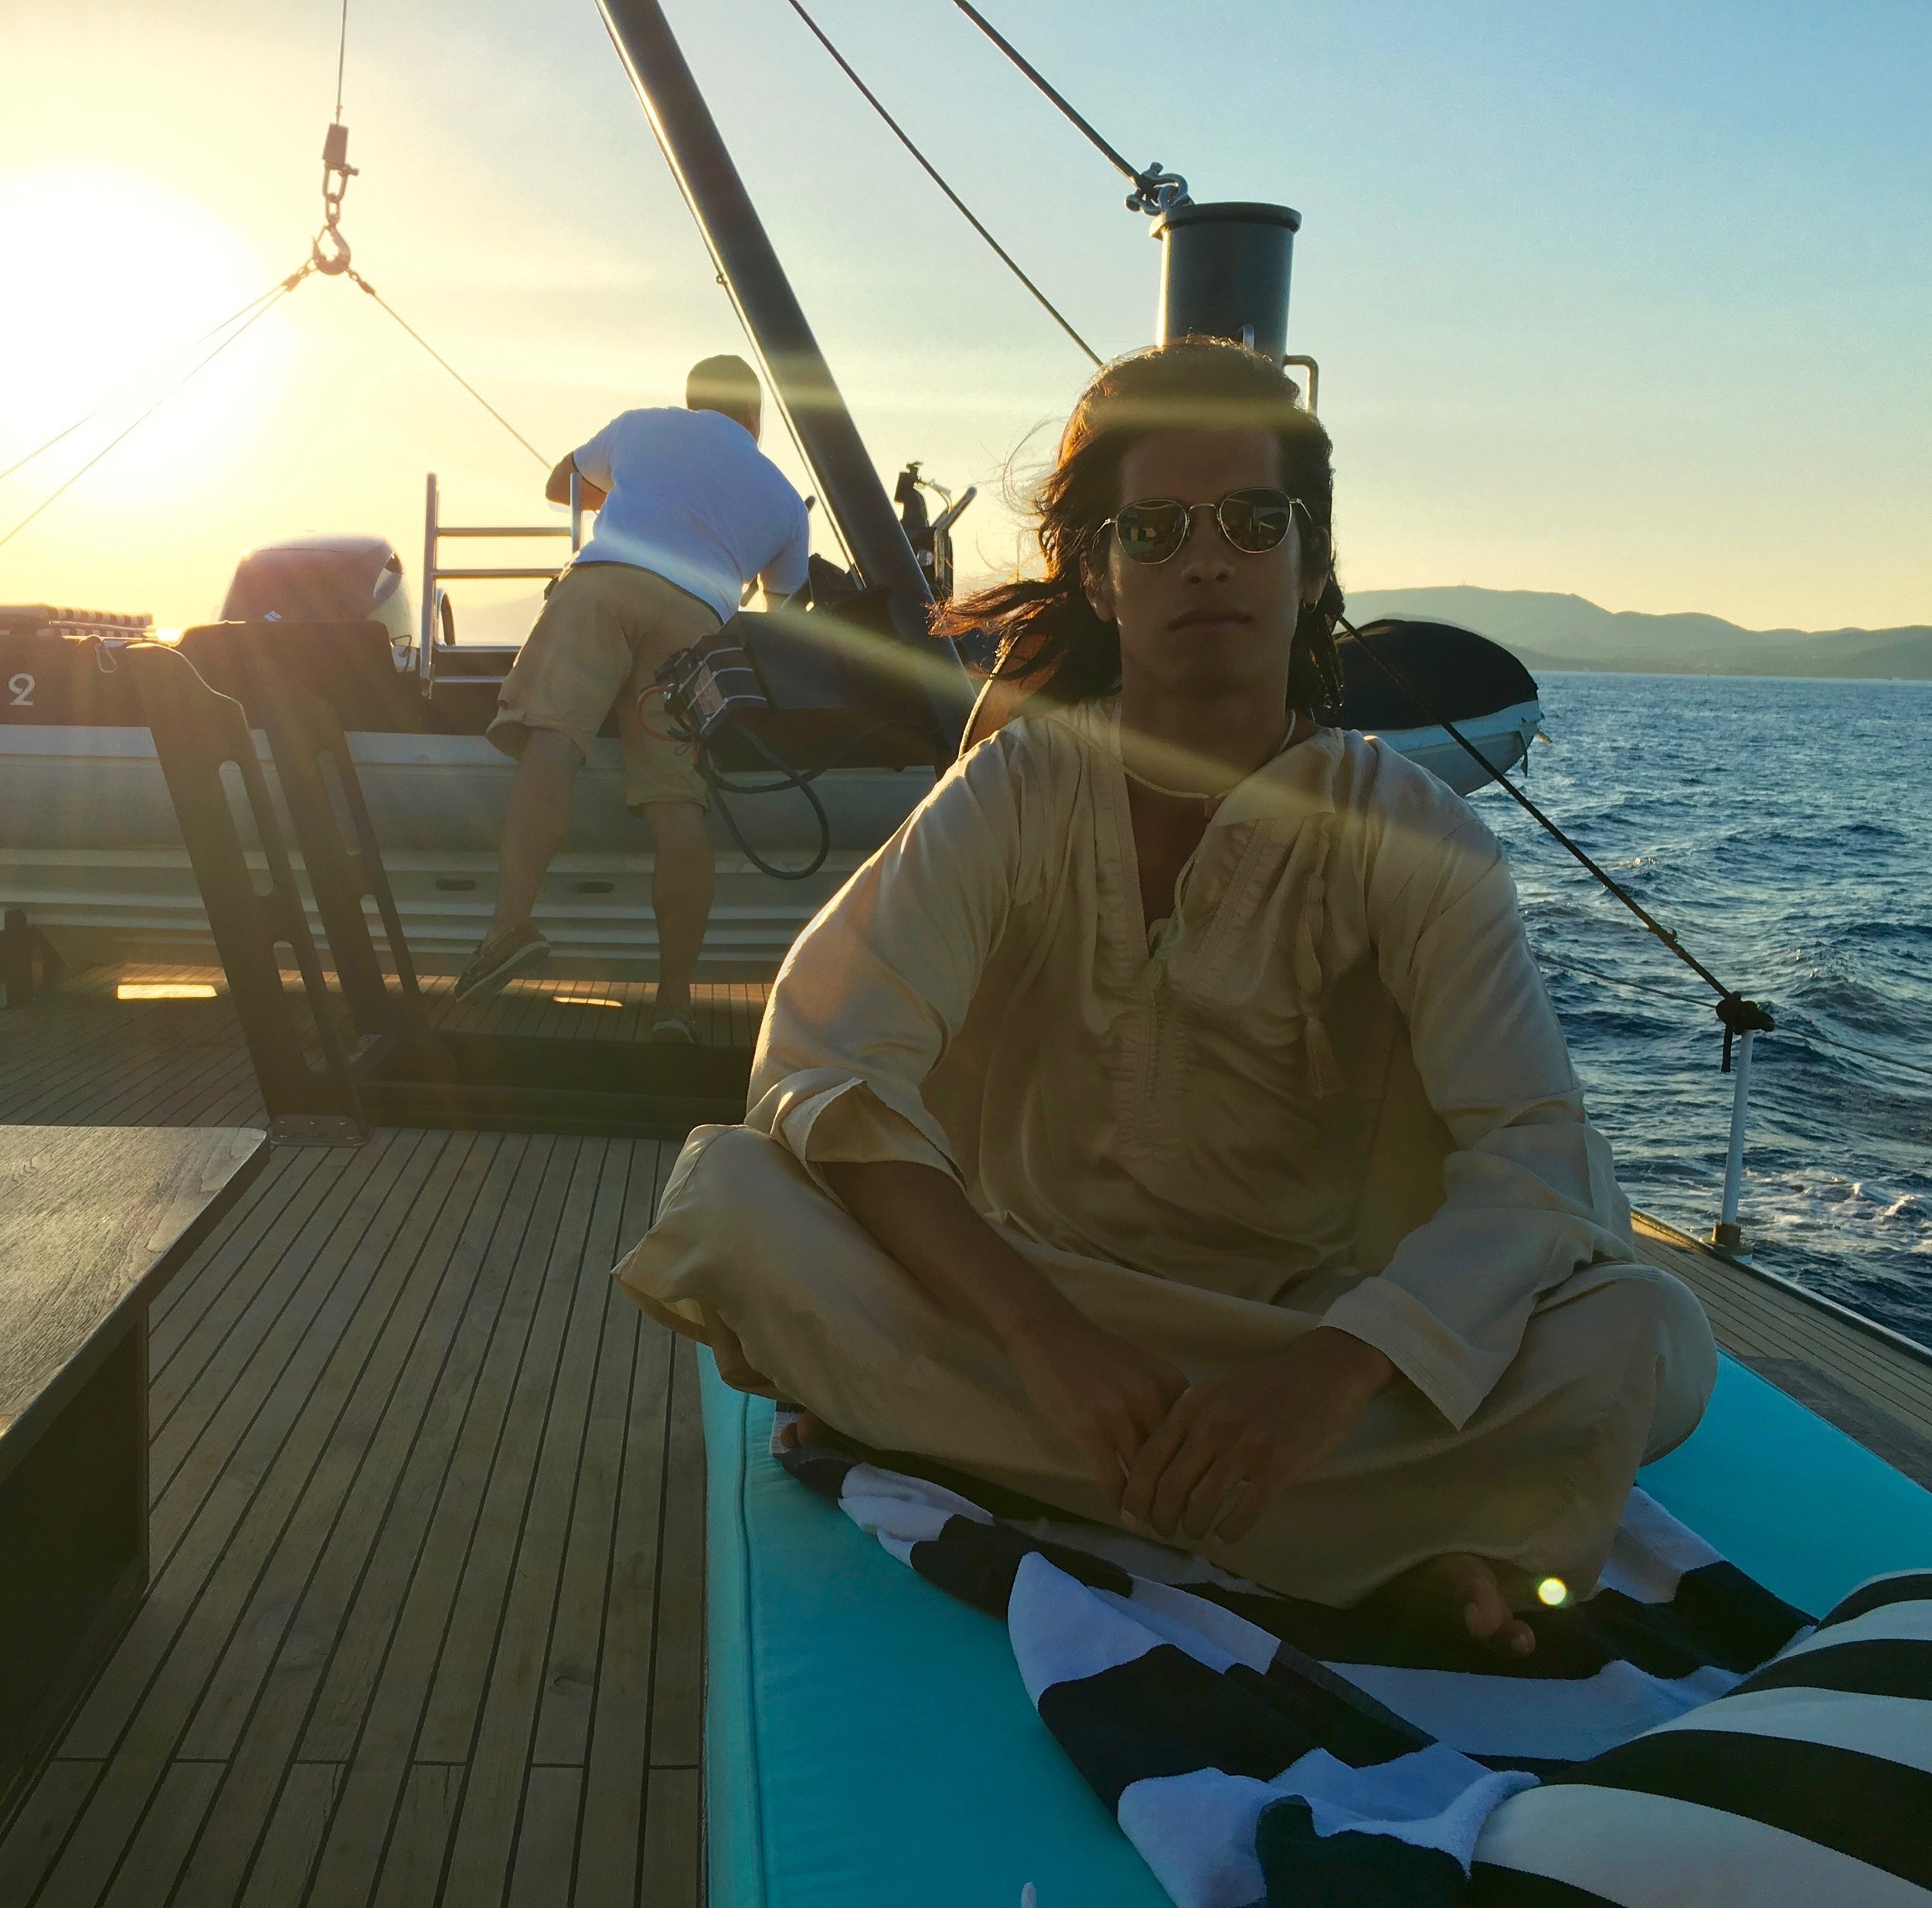 Roland's fiancéOmar on board the Maid Marion II, somewhere in the Mediterranean - 3 Days*